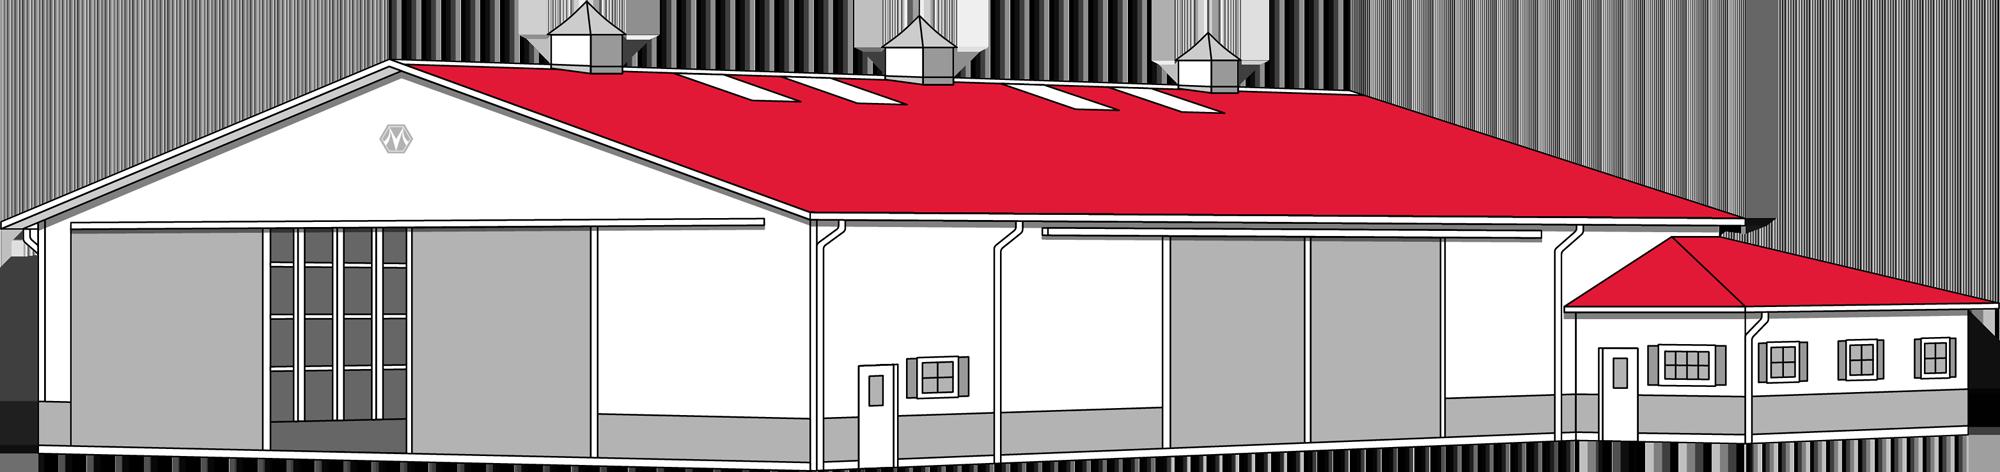 svg Repairs morton buildings steel. Warehouse clipart pole barn